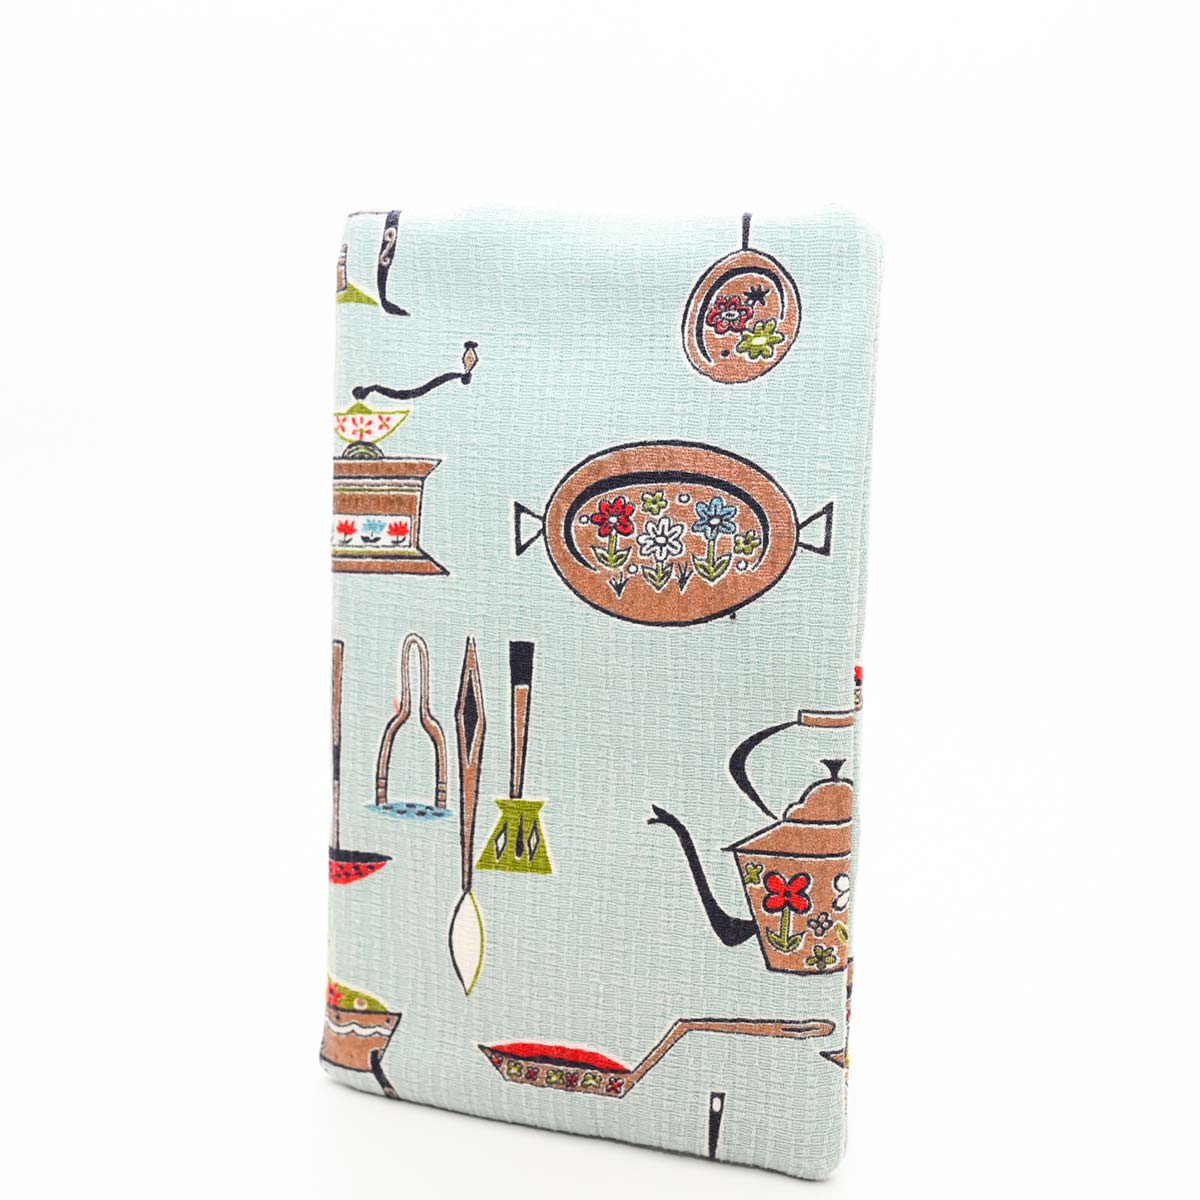 cellphone bag 1950s kitchen motif